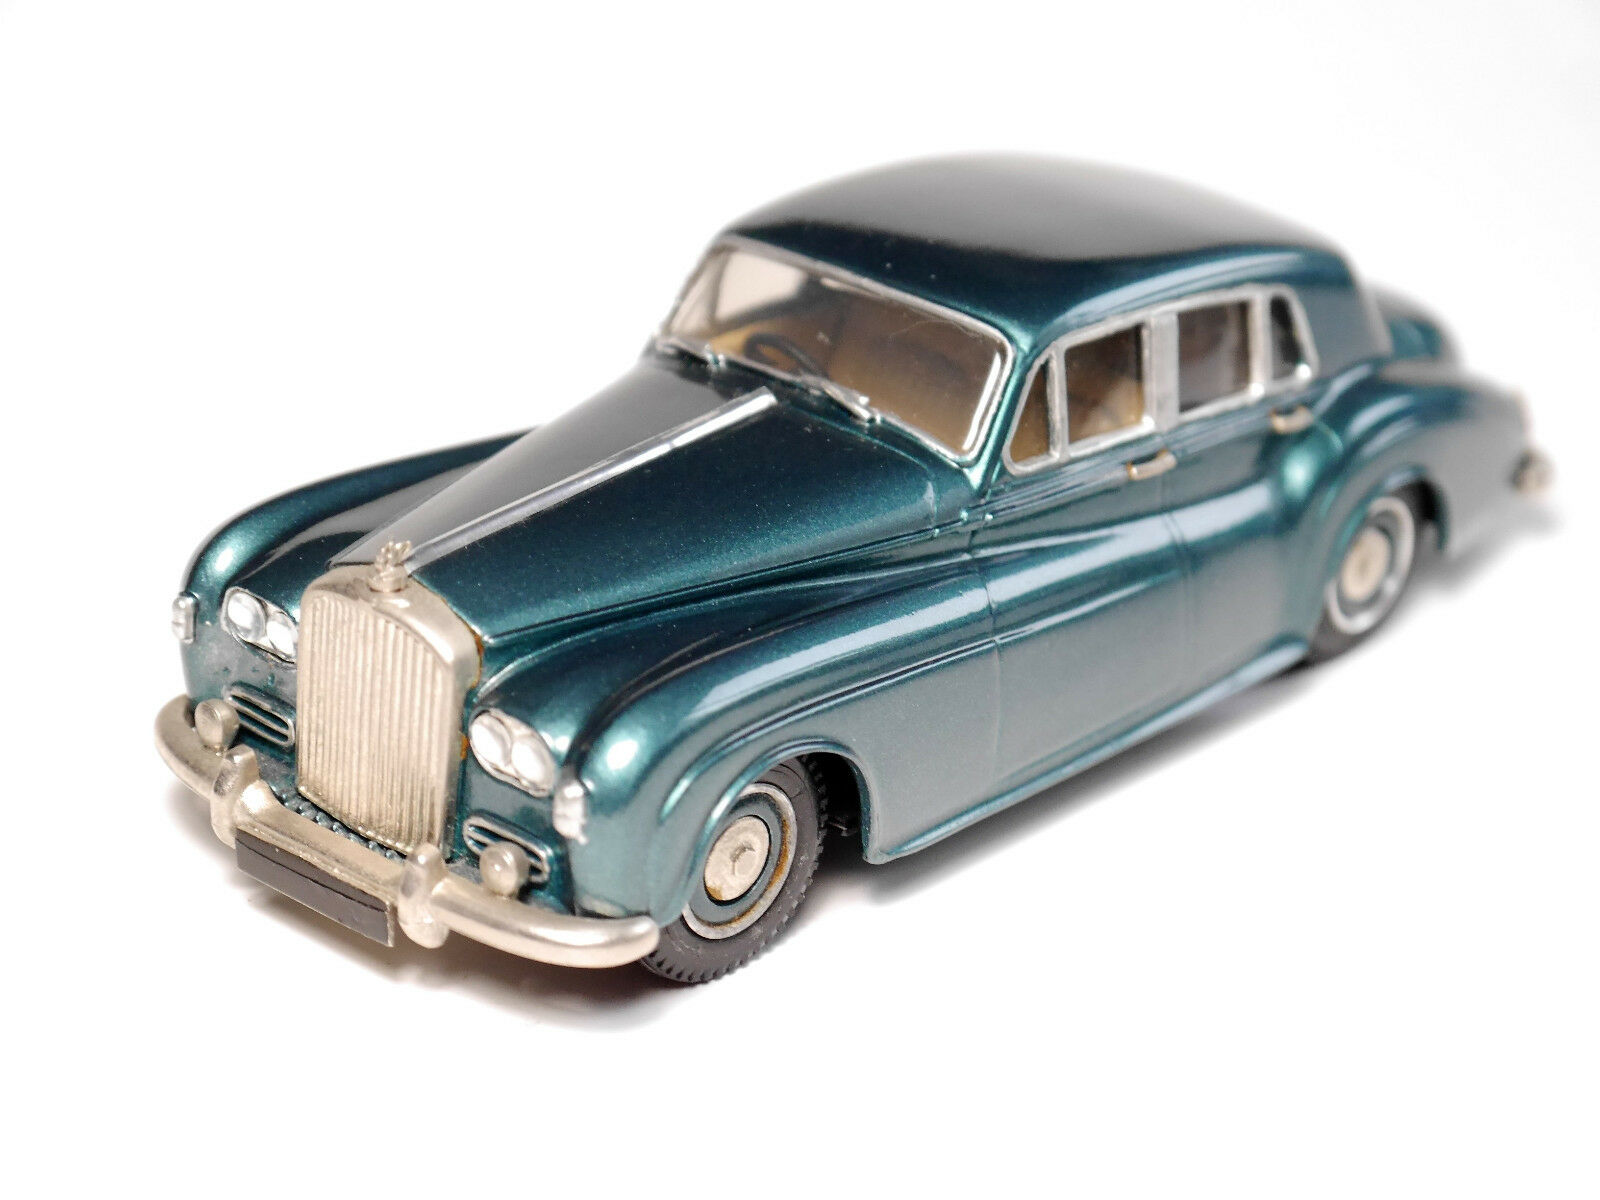 Bentley S III Saloon Petrol Metallic, à la main handmade  Western Models 1 43  coloris étonnants